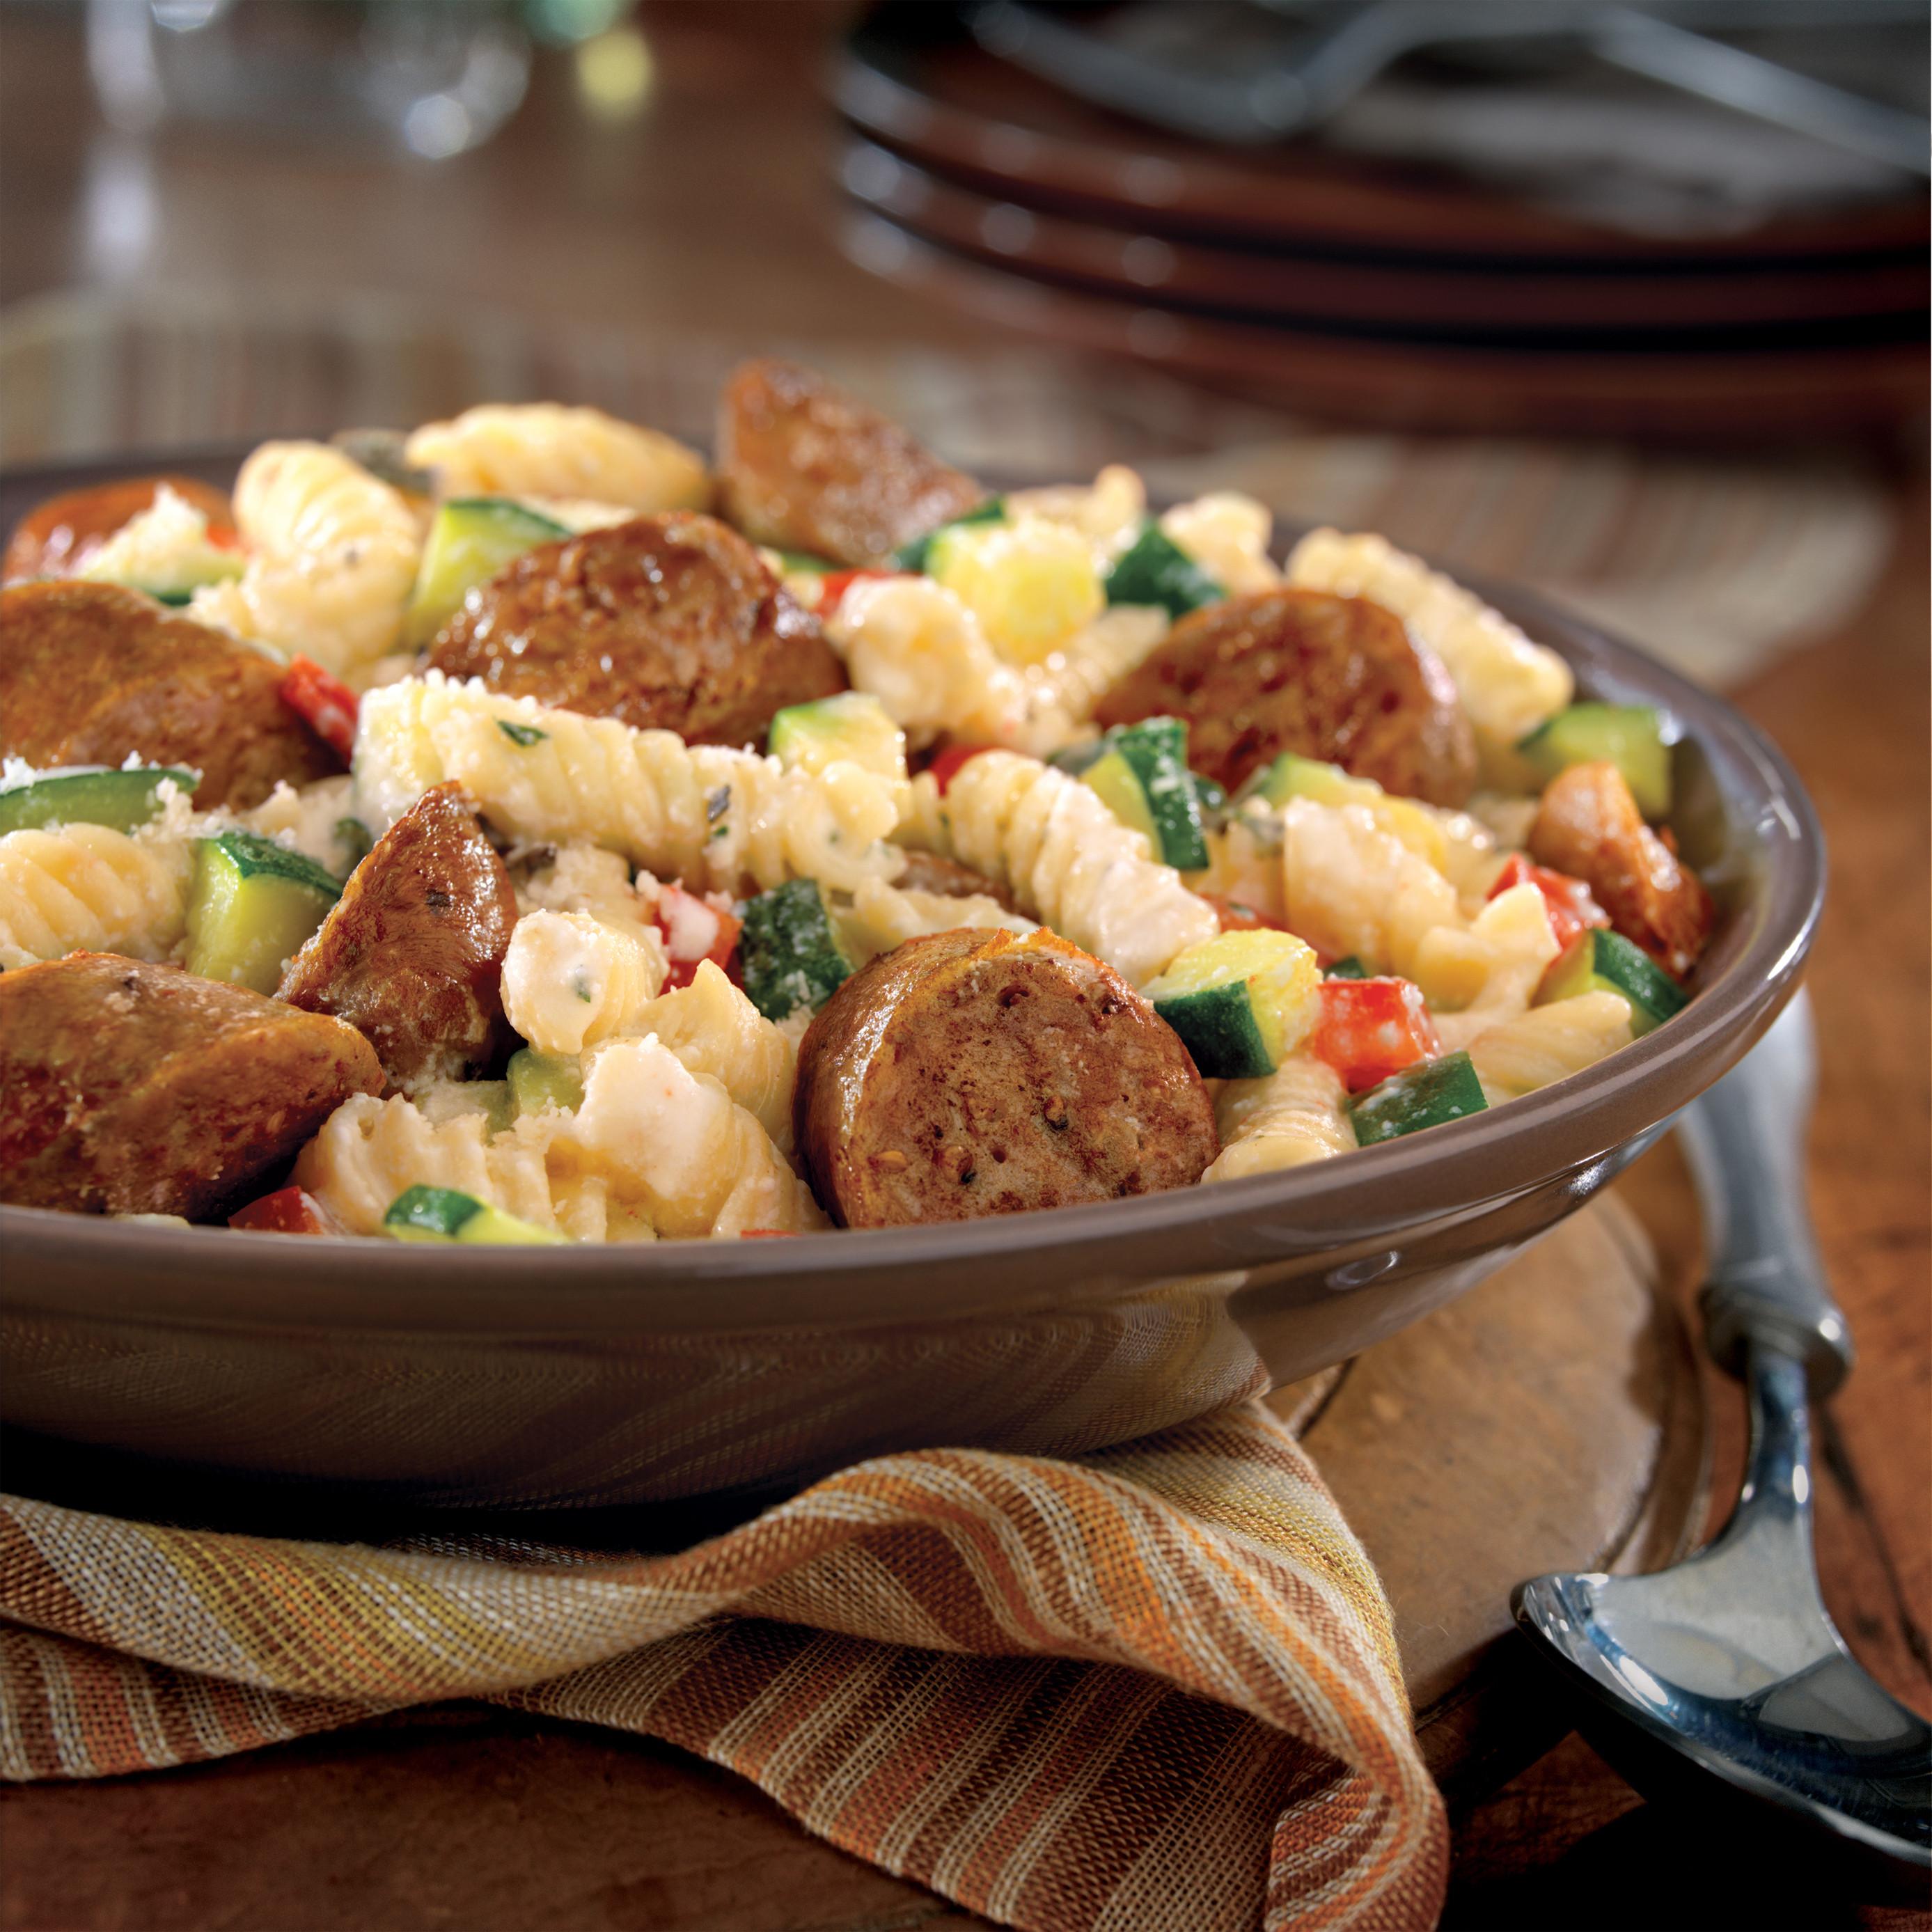 Italian Sausage Recipes  Italian Sausage with Pasta and Herbs Pork Recipes Pork